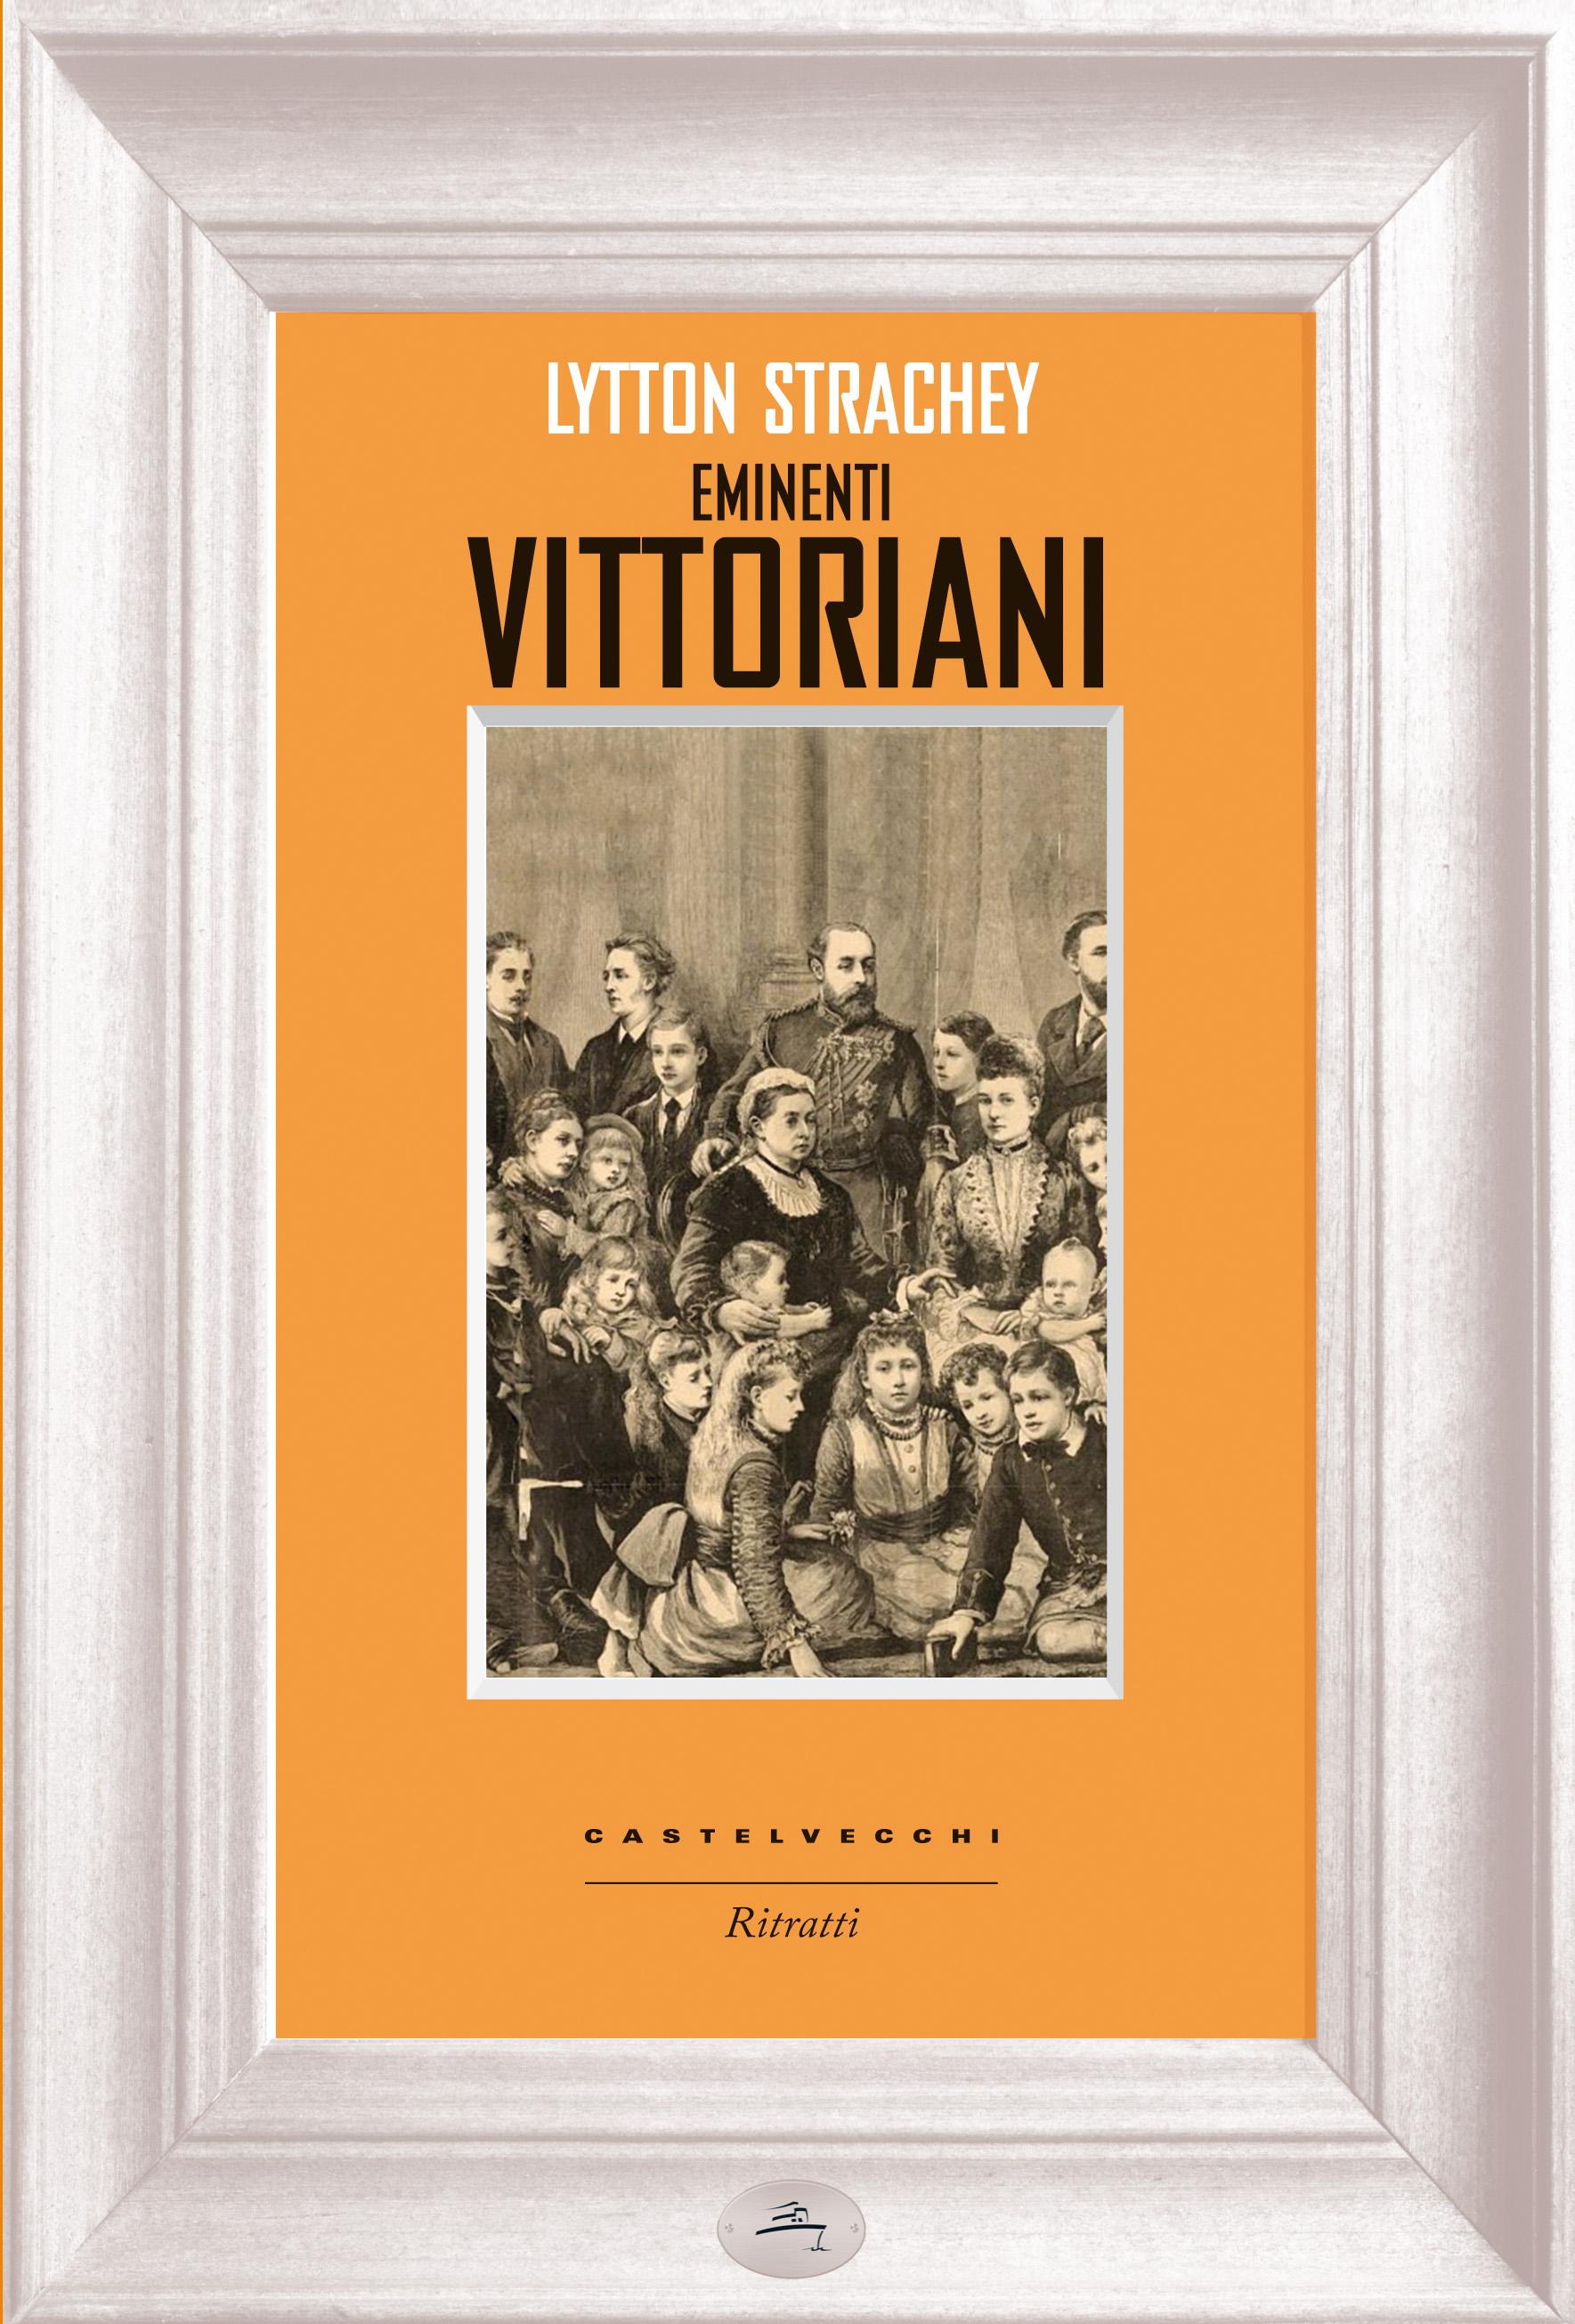 Eminenti Vittoriani